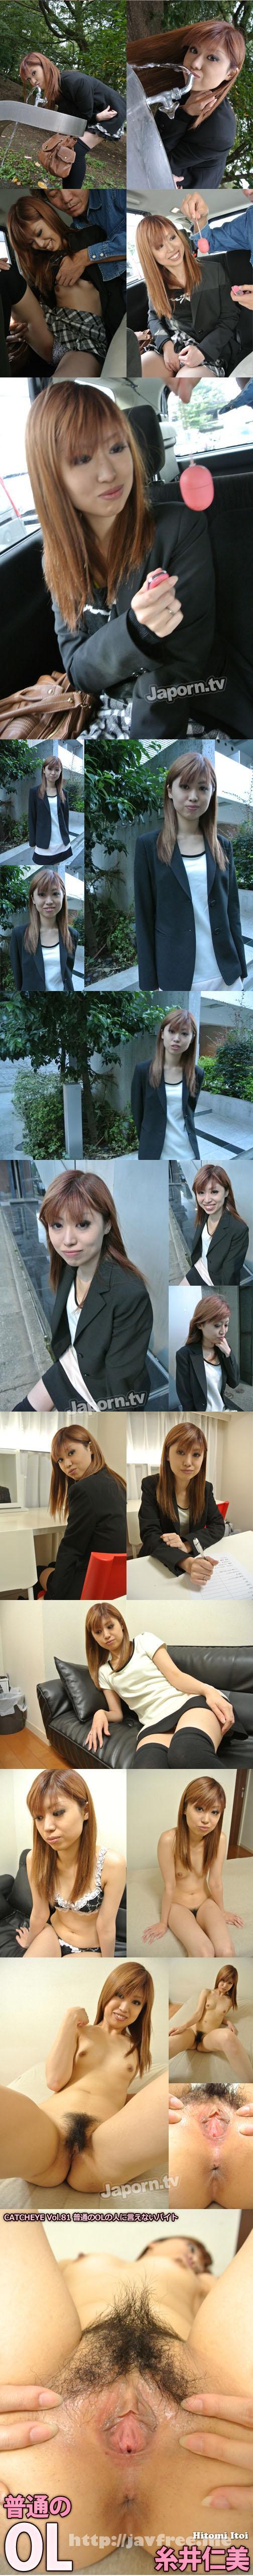 [DRC 081] CATCHEYE Vol.81 普通のOLの人に言えないバイト : 糸井仁美 糸井仁美 Hitomi Itoi DRC